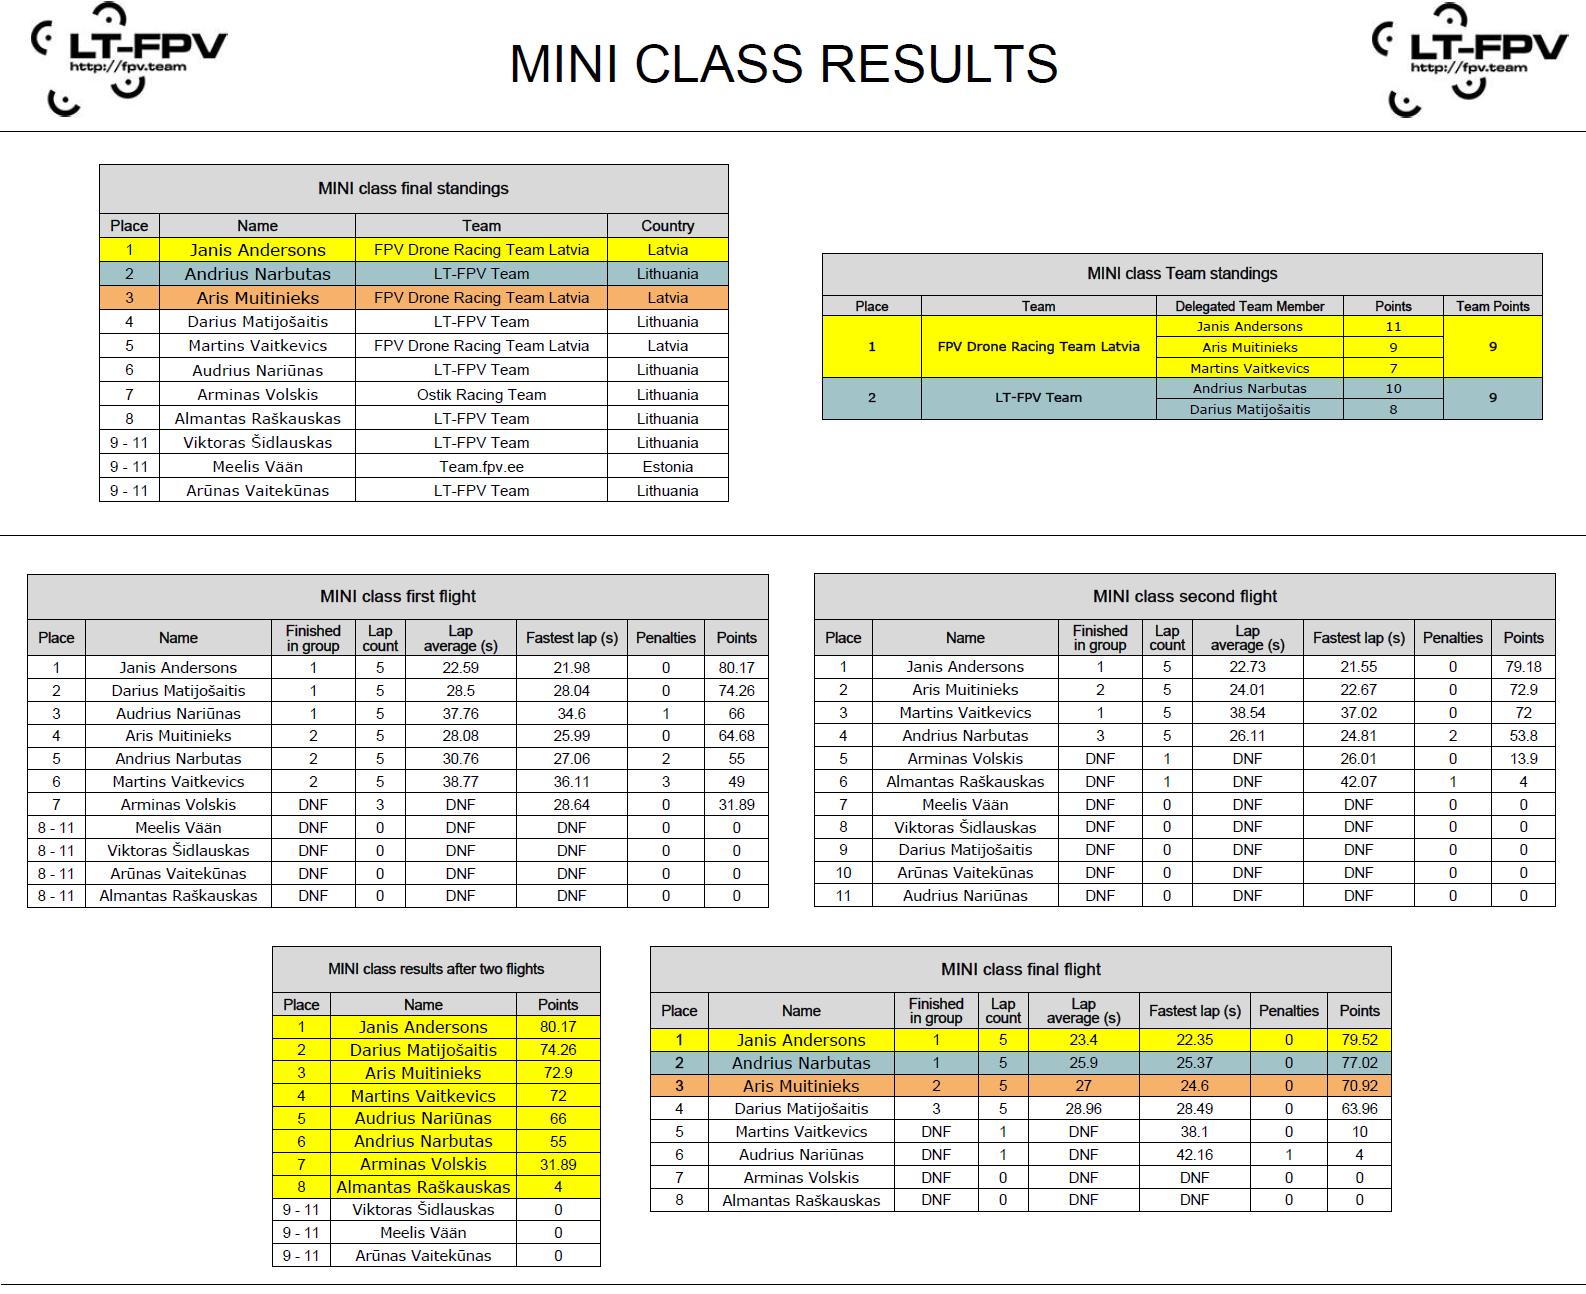 MINI class results